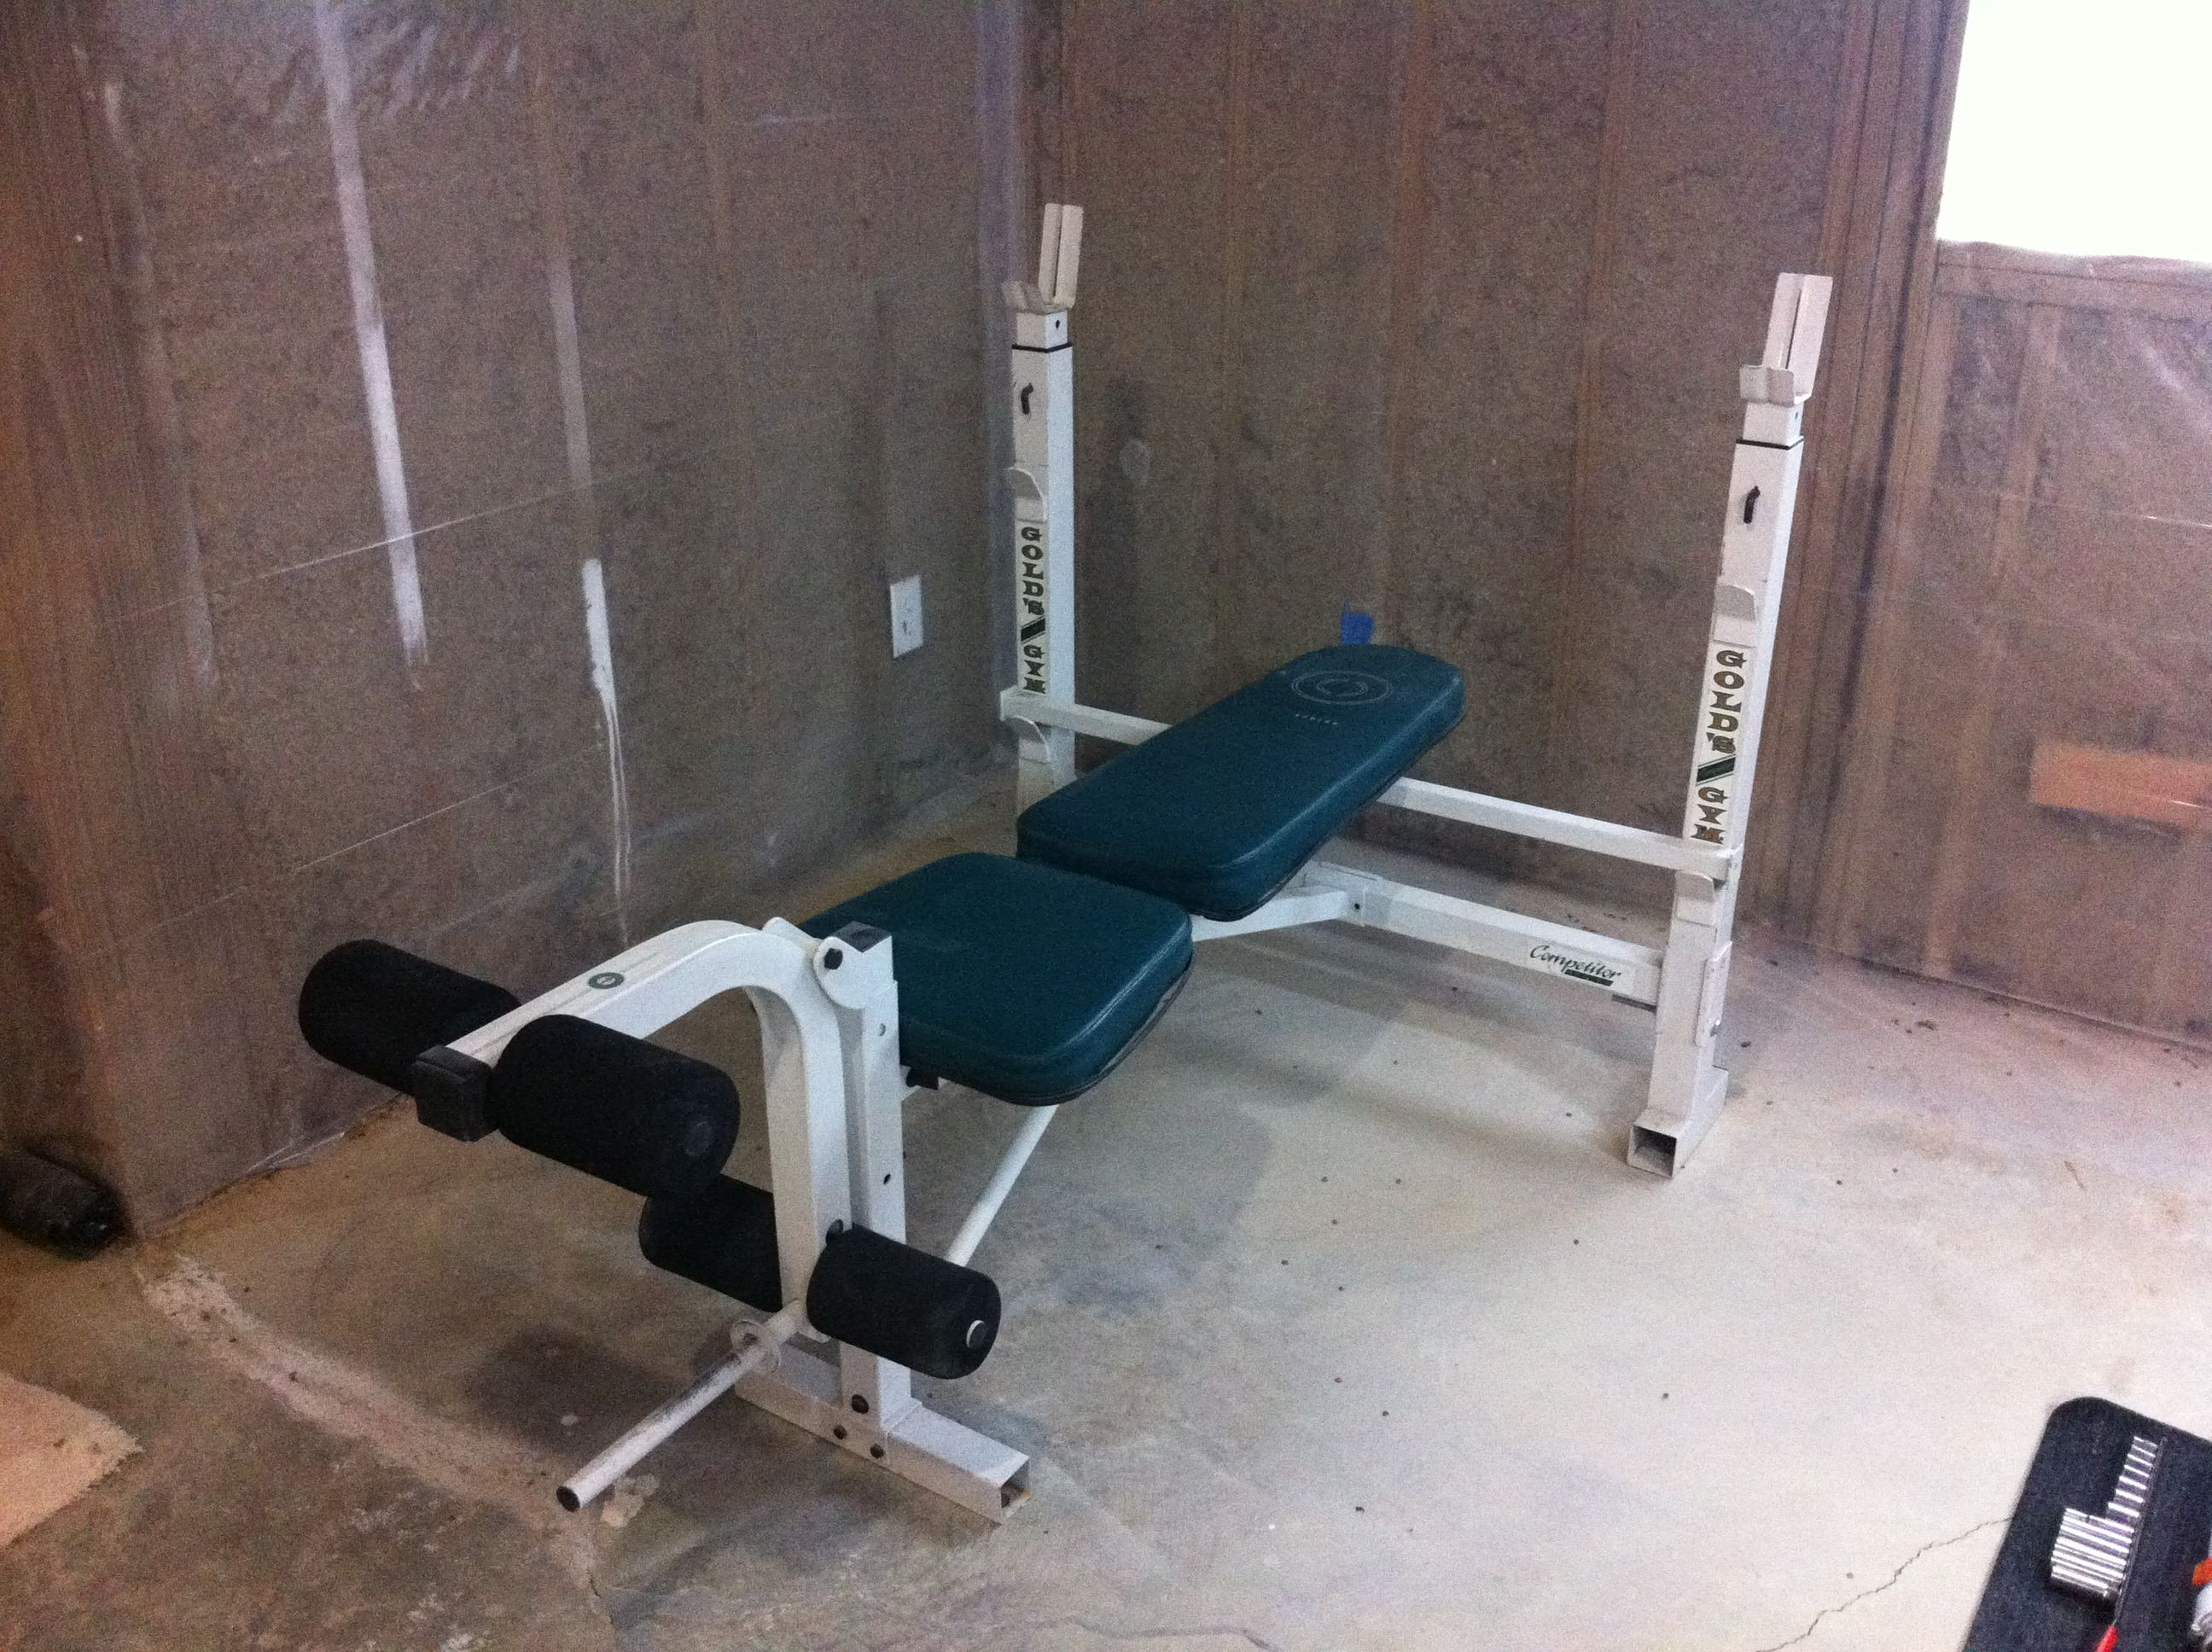 Garage gym specs price release date redesign